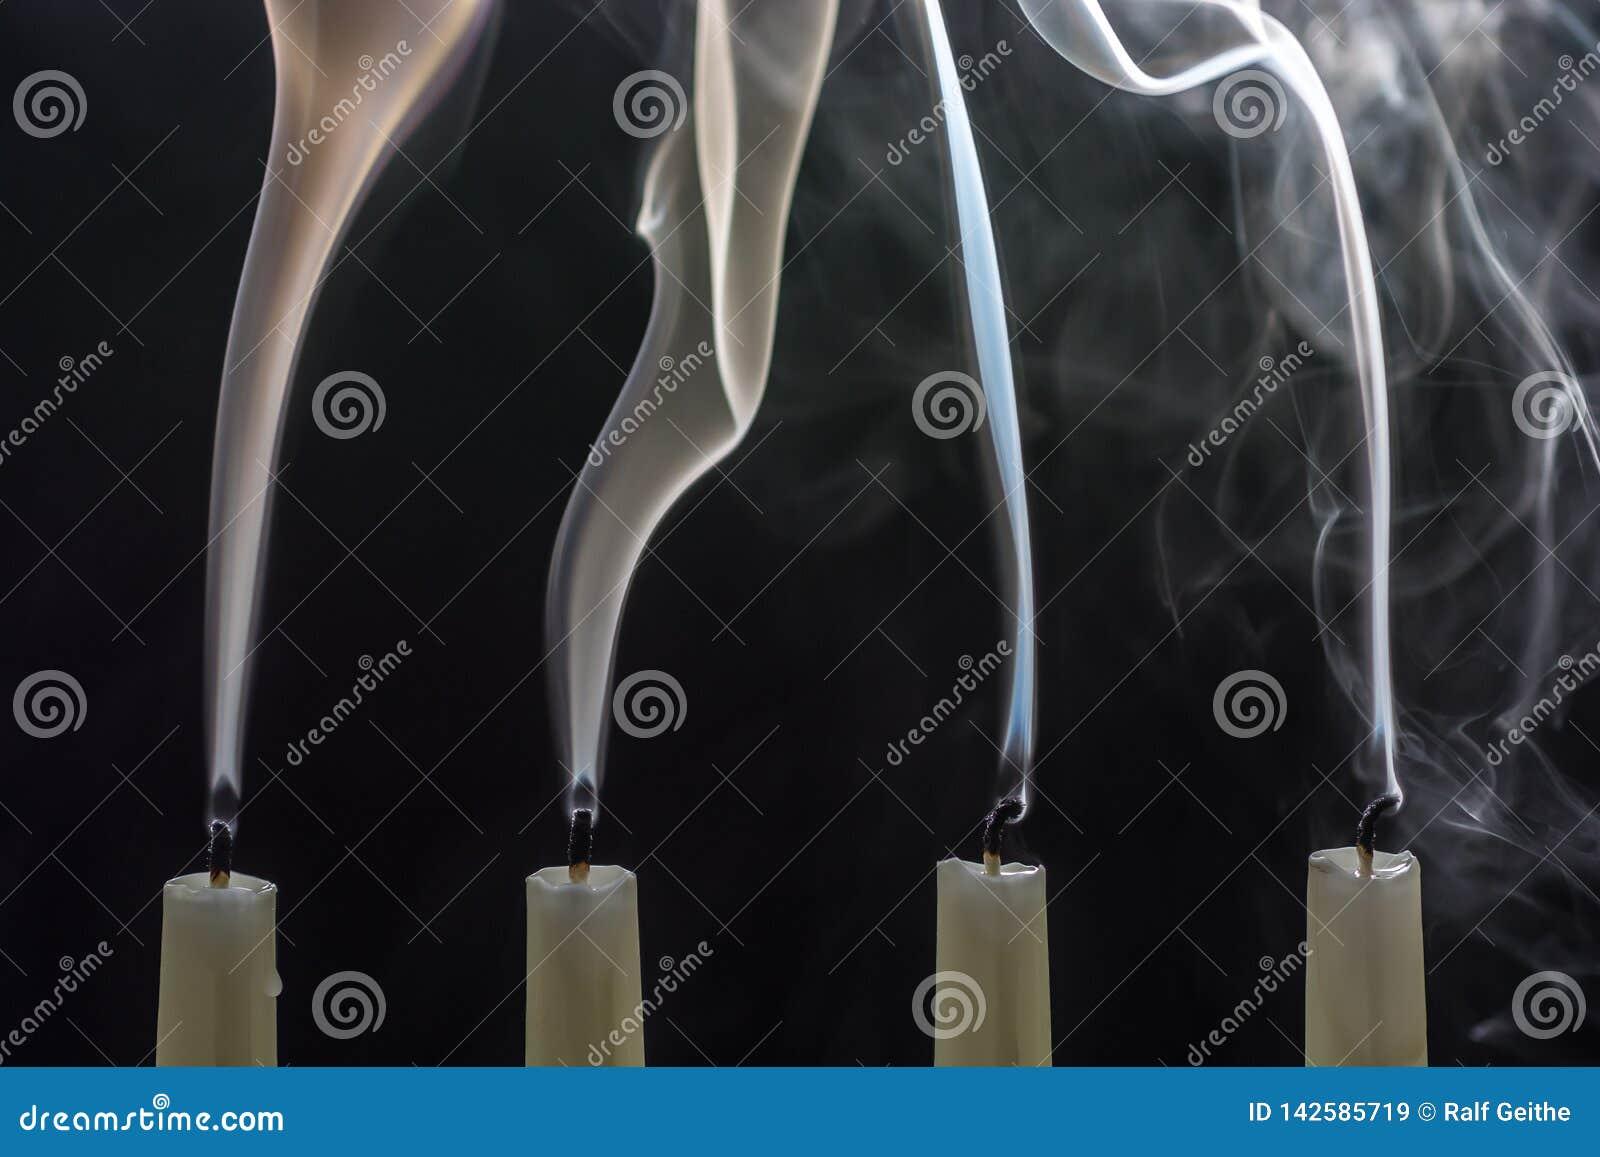 Когда рождество излишек, свечи дунуты вне